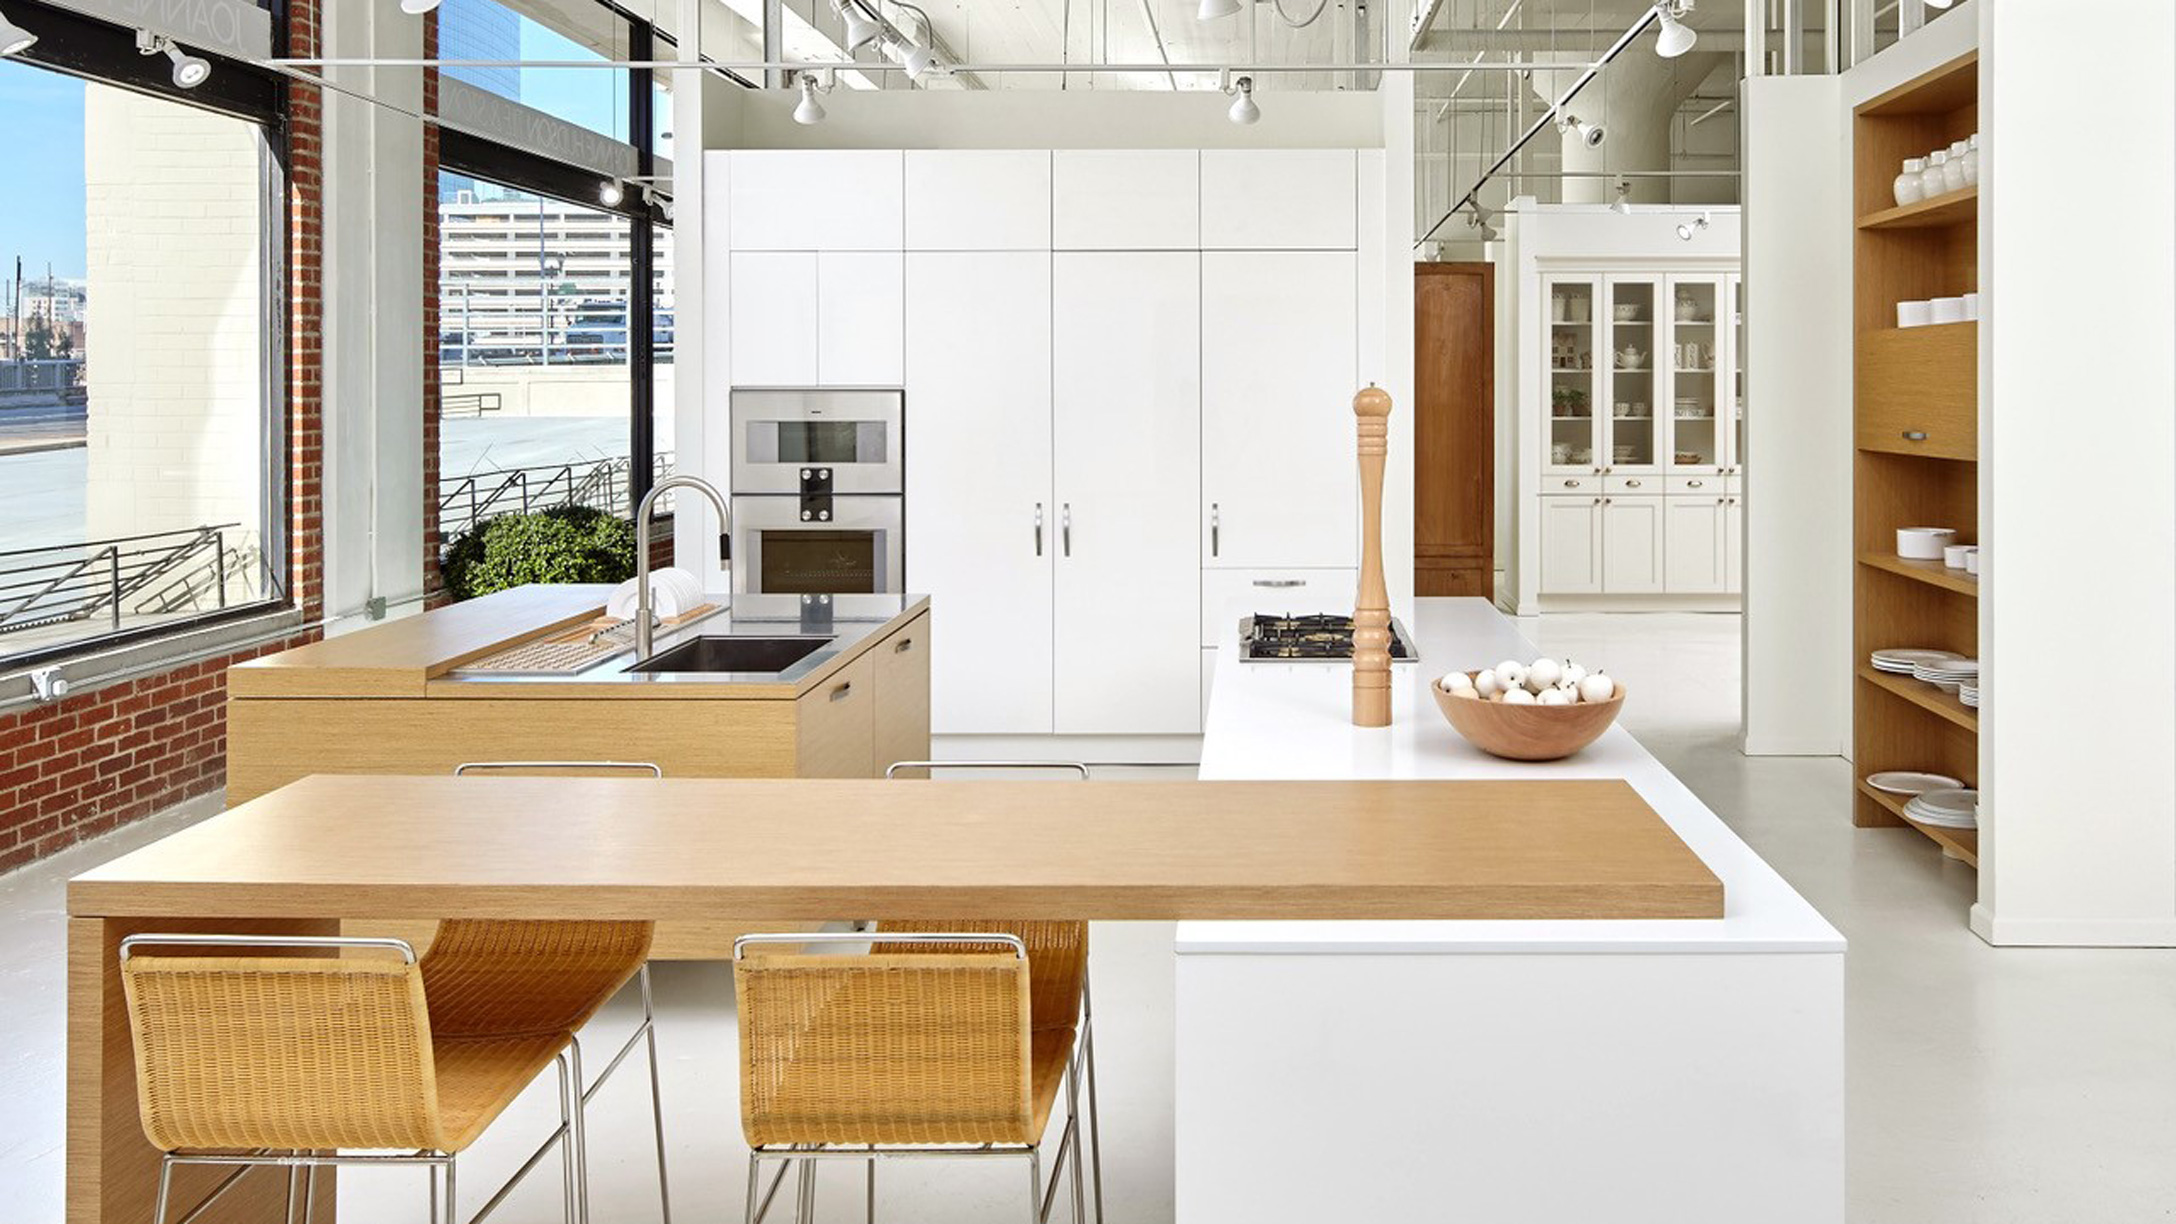 Joanne Hudson Kitchen Cabinets